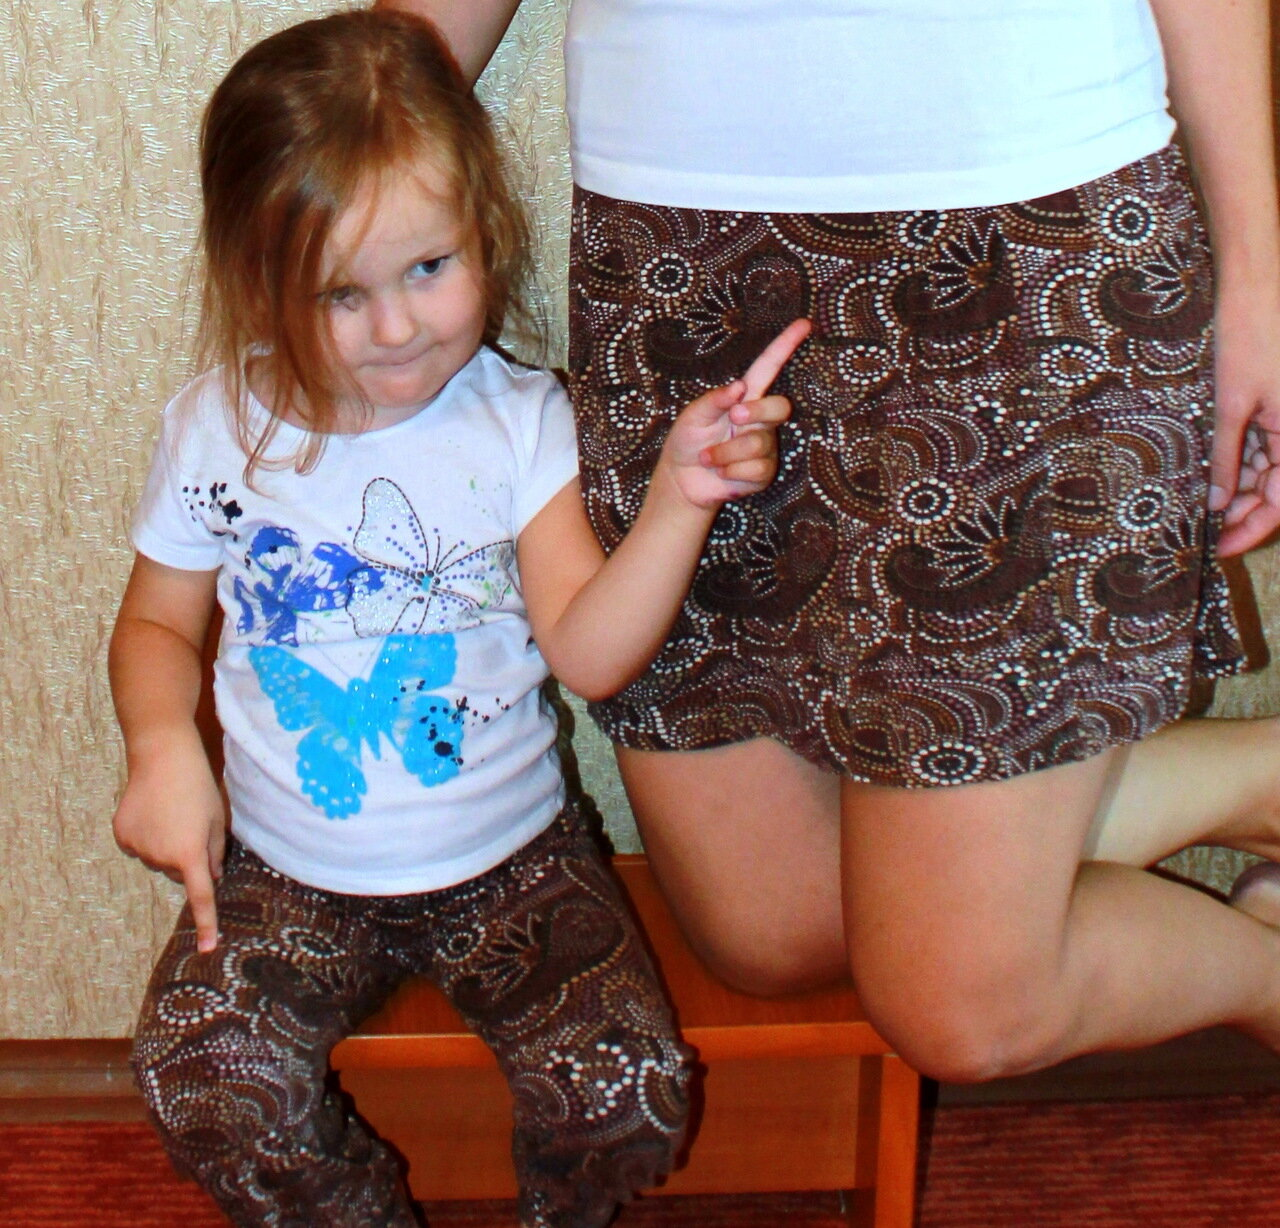 Сын нюхает мамы трусы 24 фотография